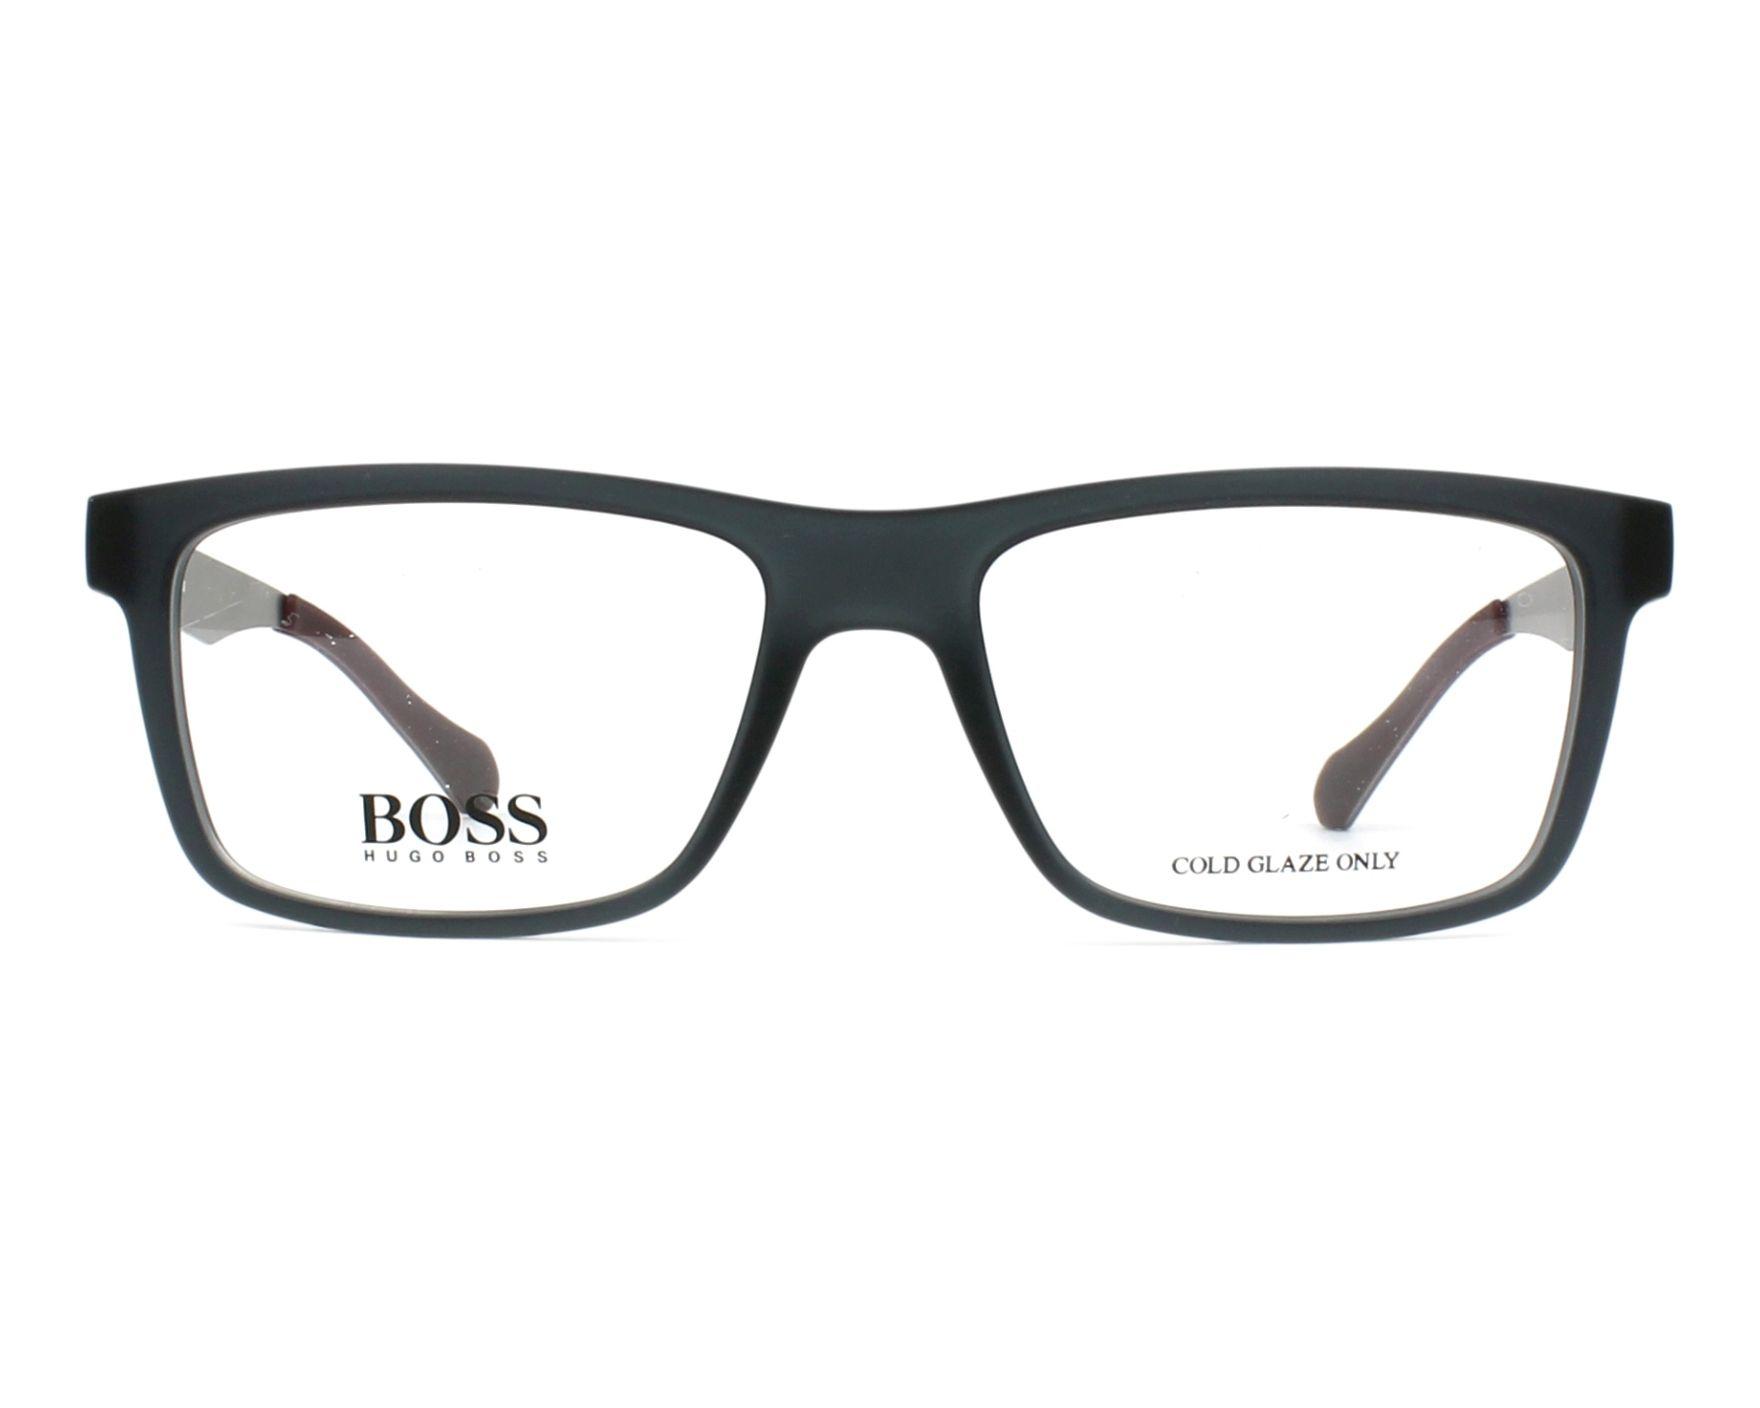 acheter des lunettes de vue hugo boss boss 0870 05g visionet. Black Bedroom Furniture Sets. Home Design Ideas